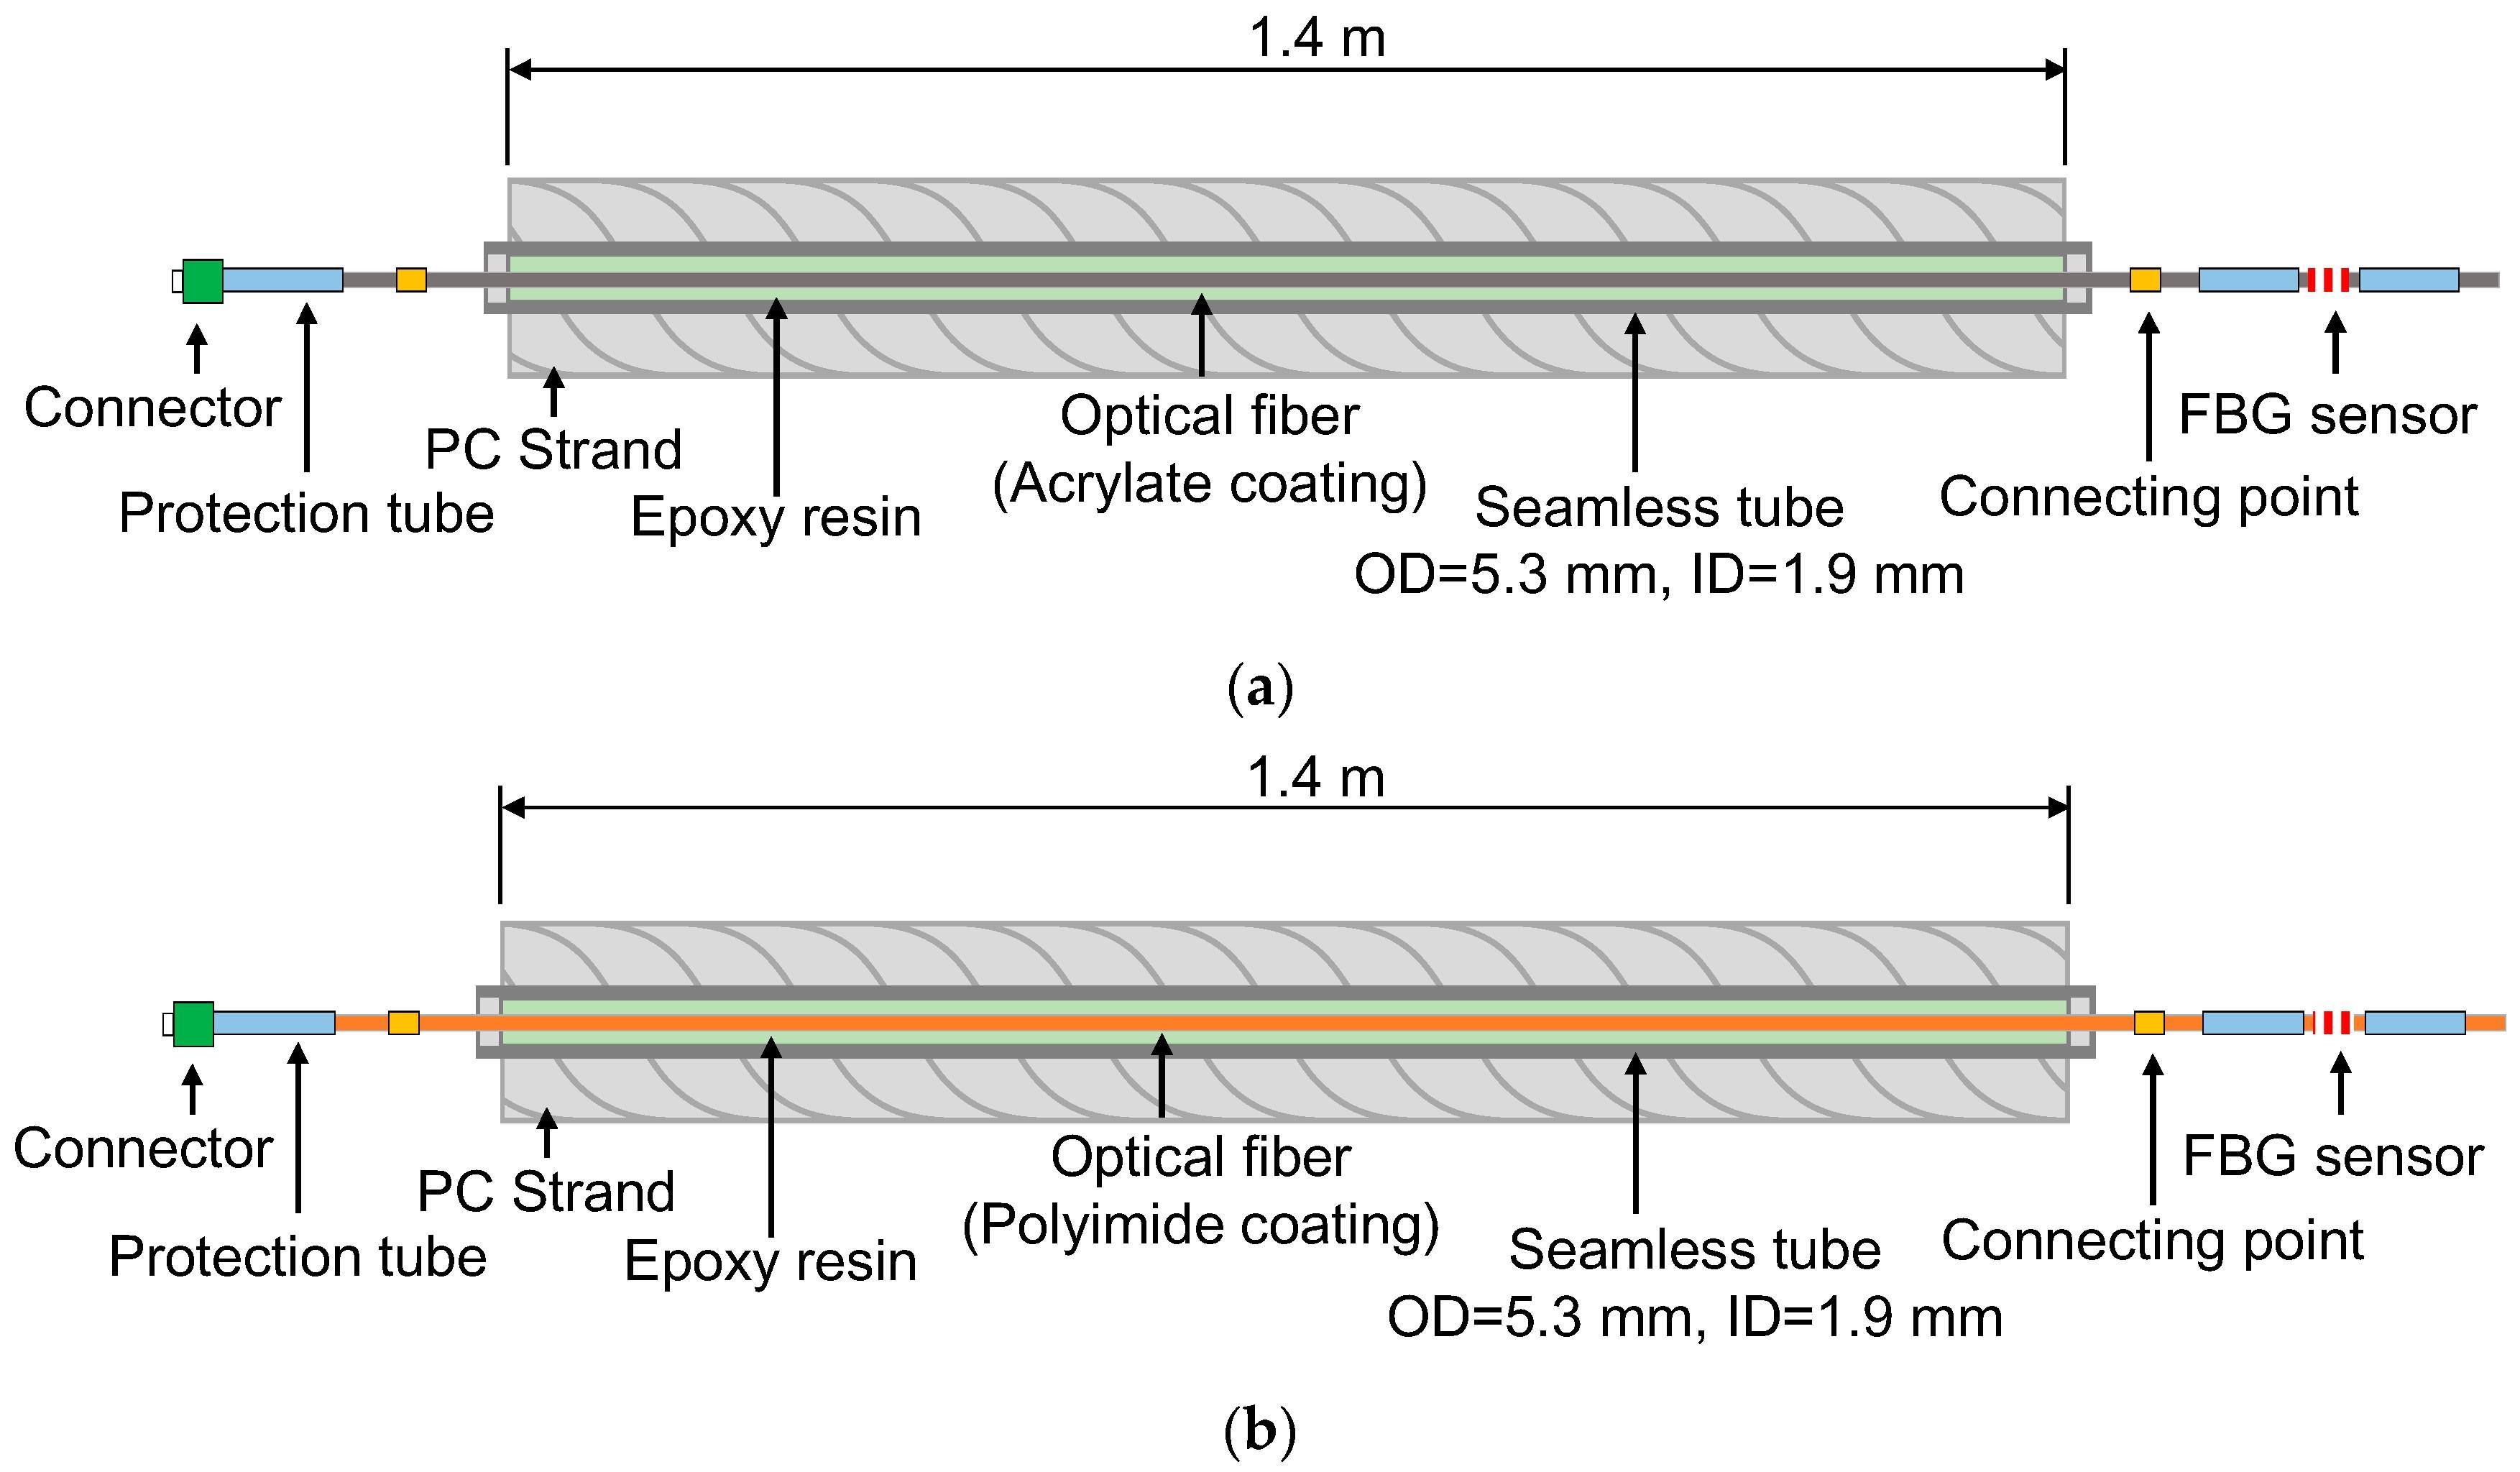 Strain Gauge Wiring Diagram Sensors Free Full Text Of Strain Gauge Wiring Diagram